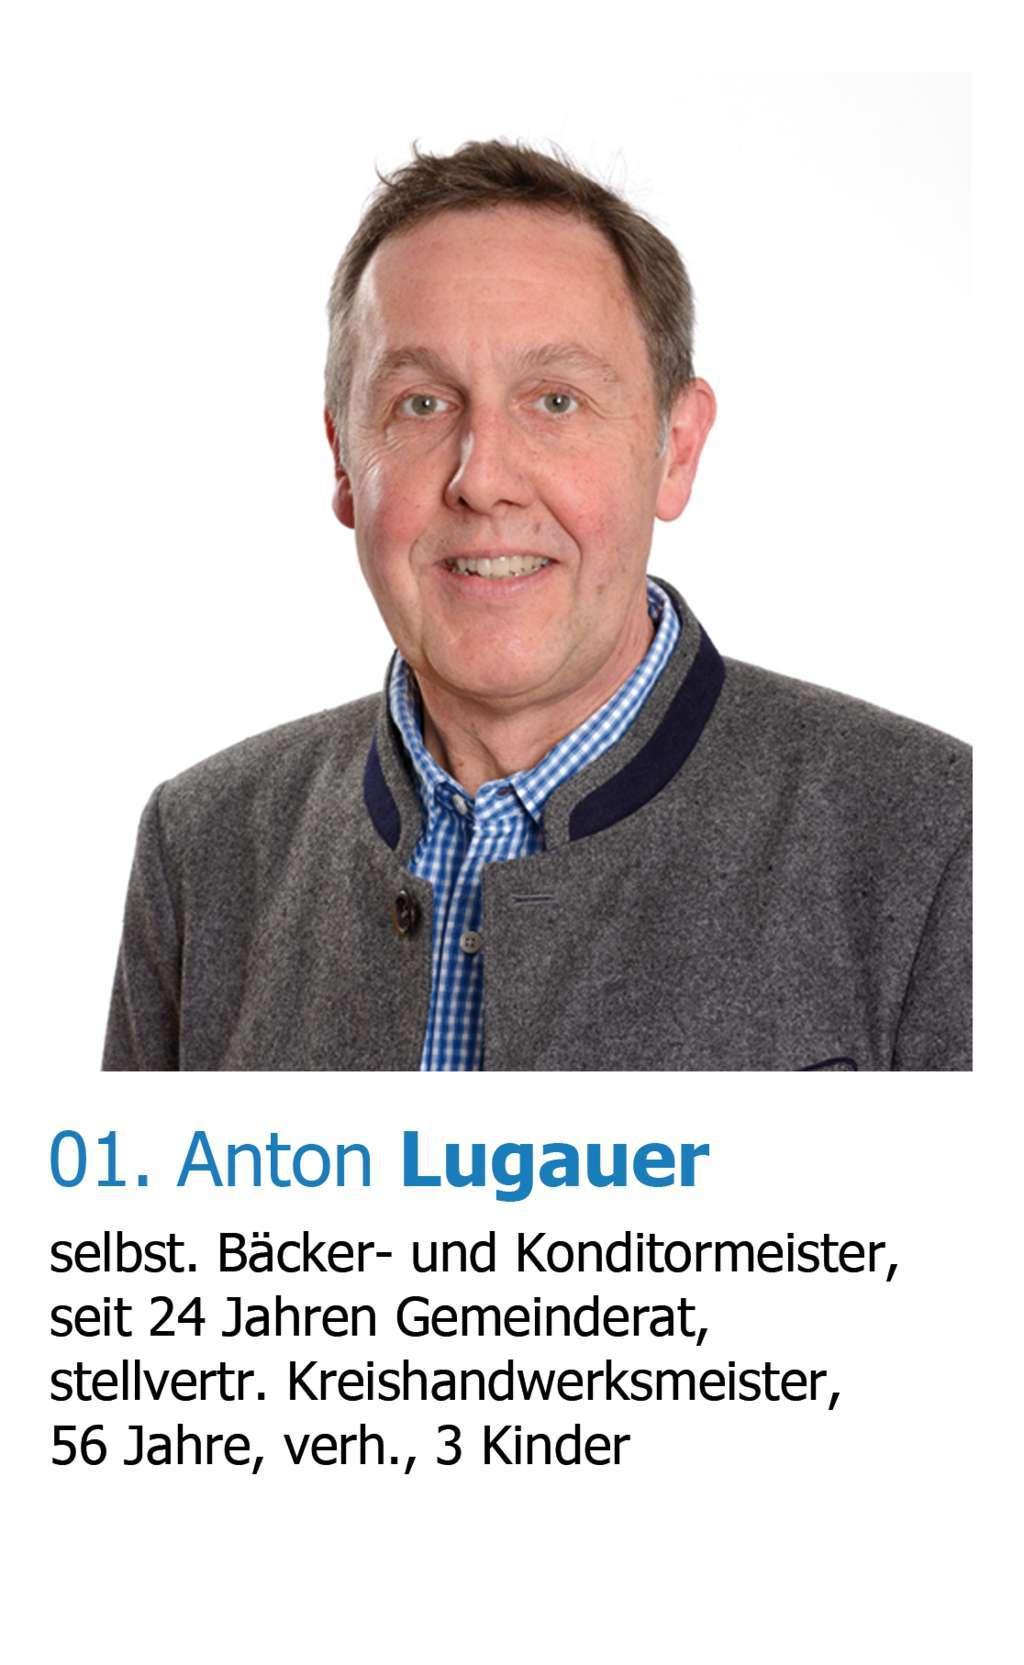 Anton Lugauer